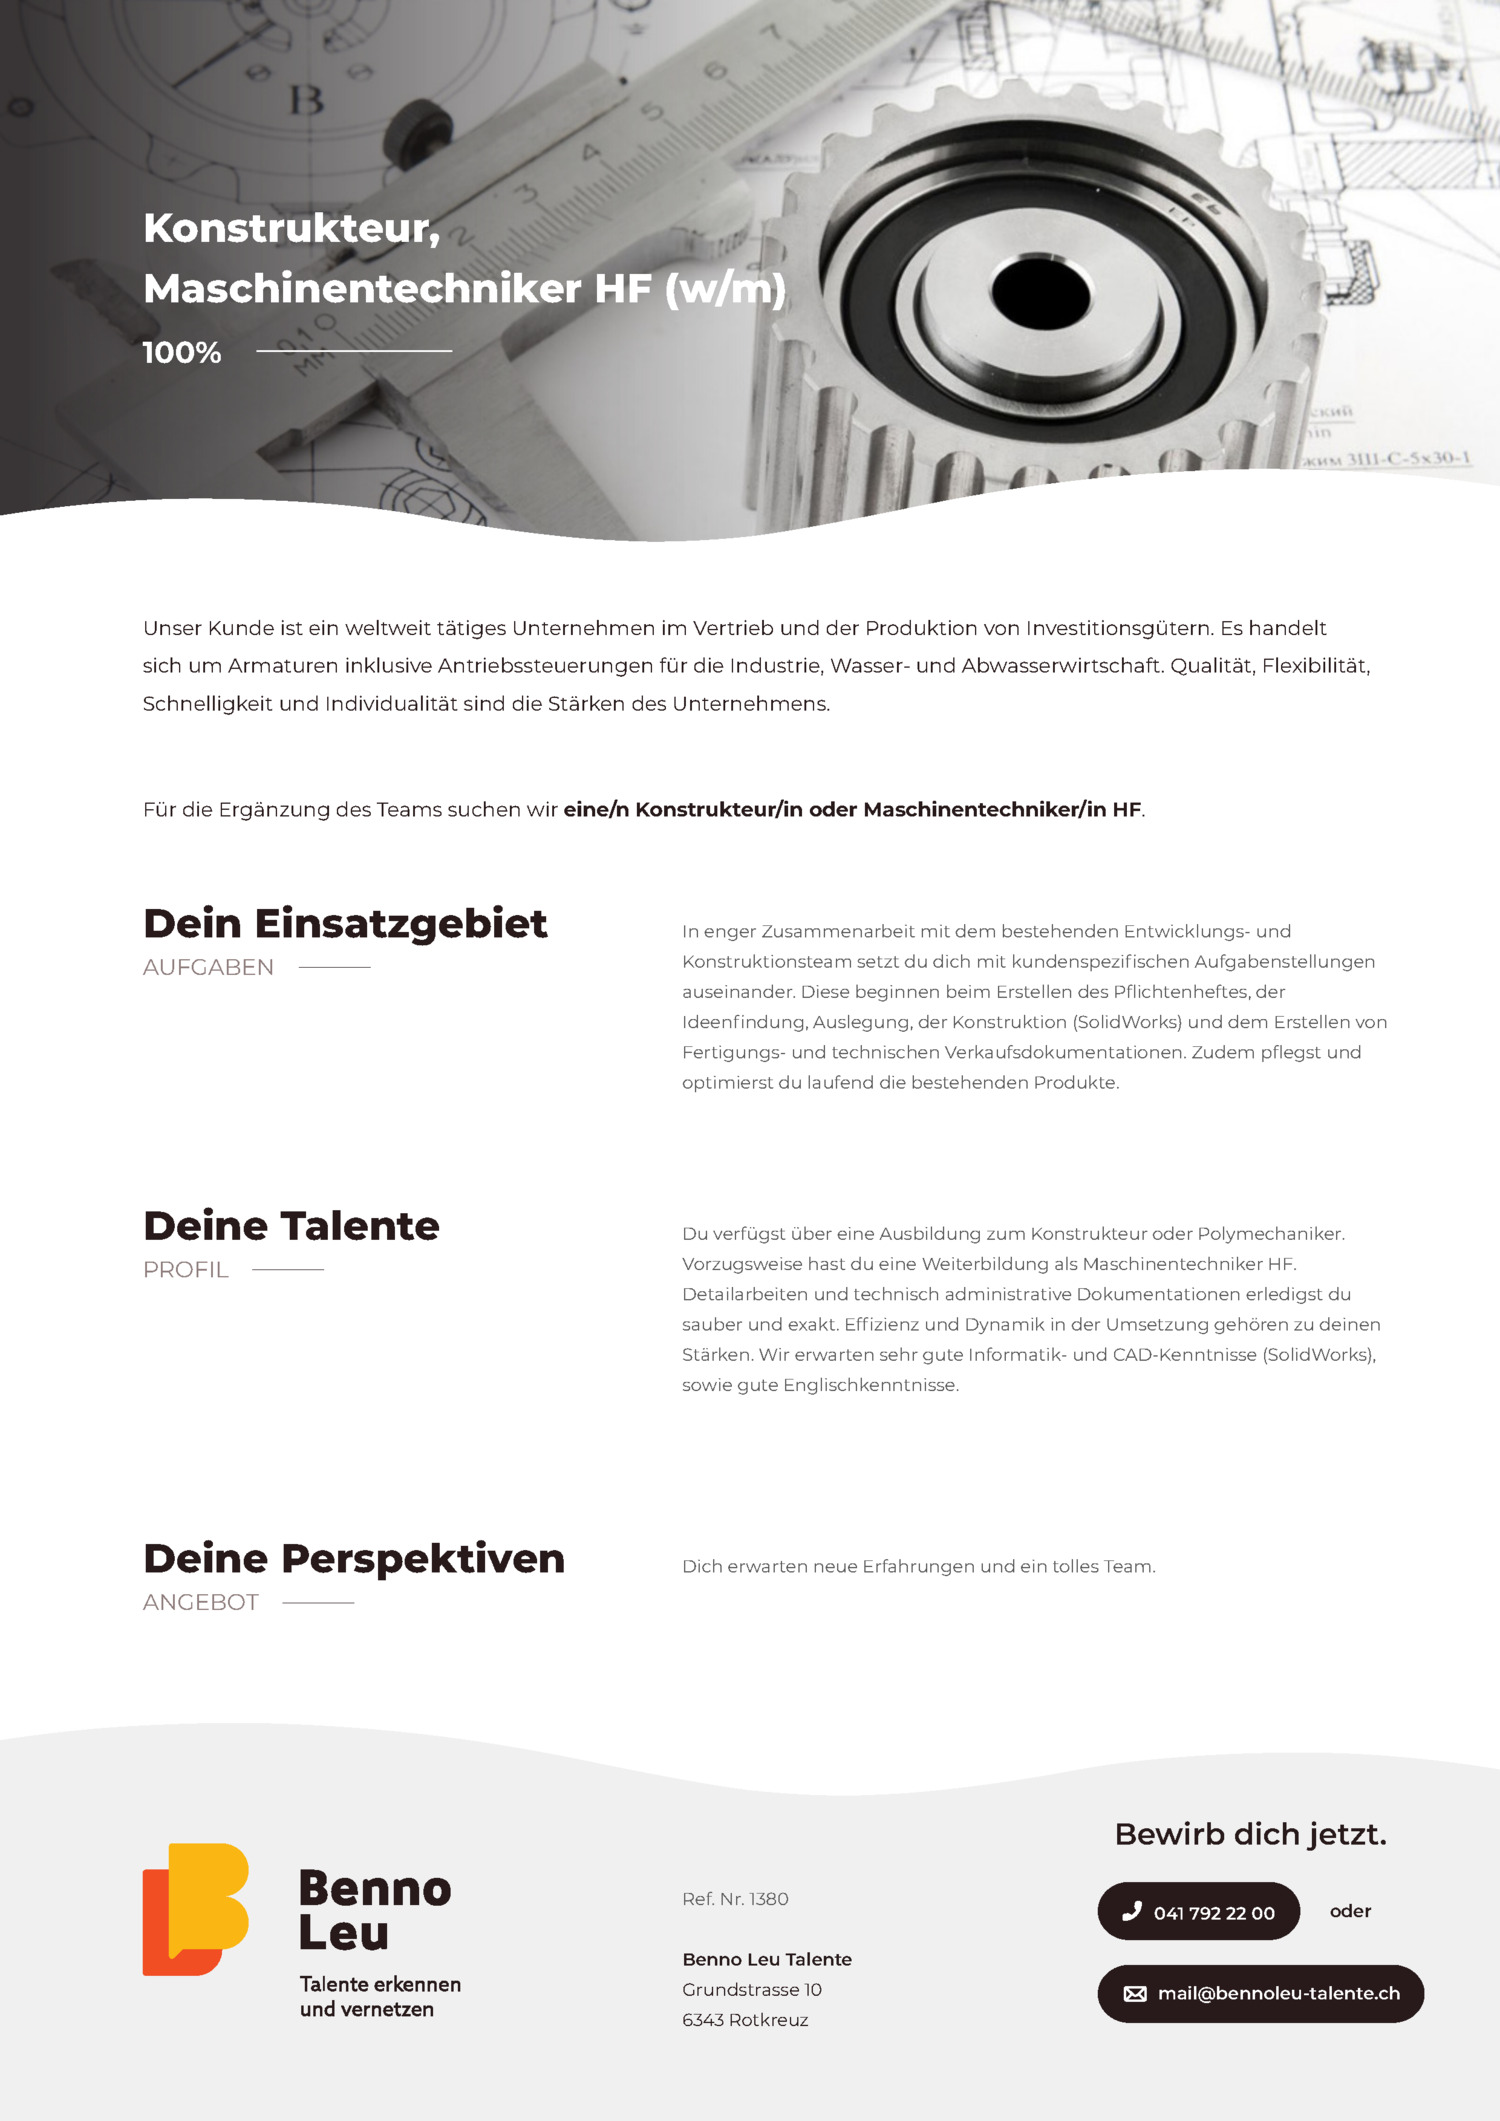 Inserat Konstrukteur, Maschinentechniker HF (w/m)